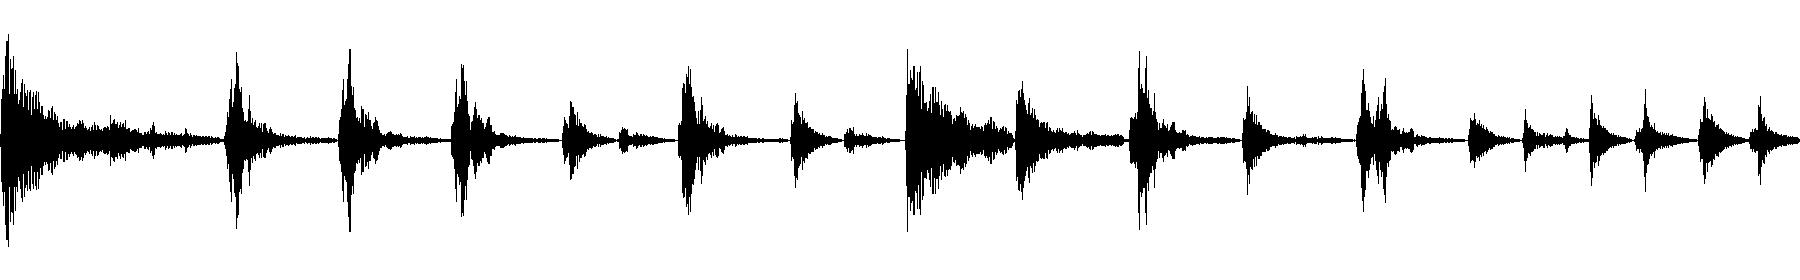 arab percussion loop 34